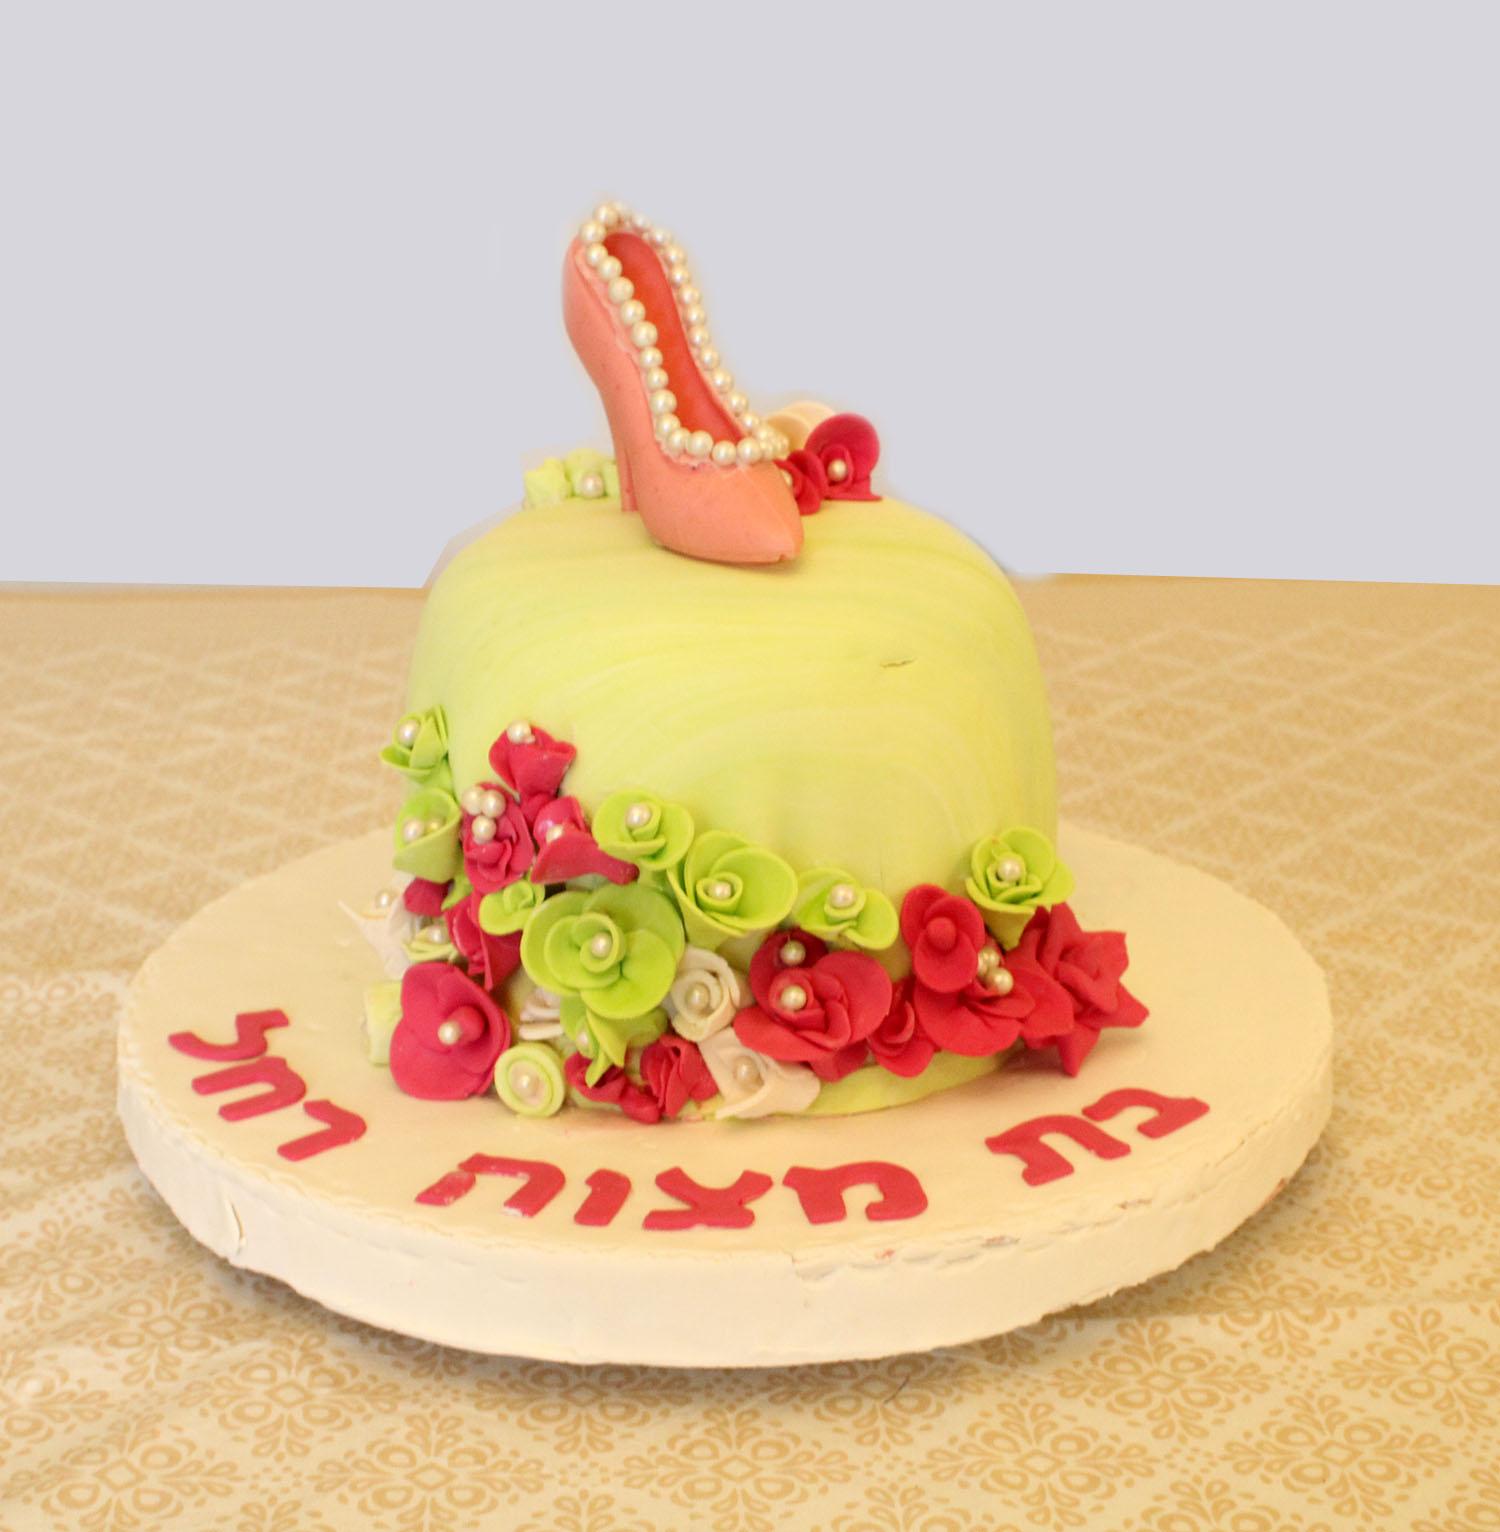 IMG 6337 1 - עוגה לבת מצוה